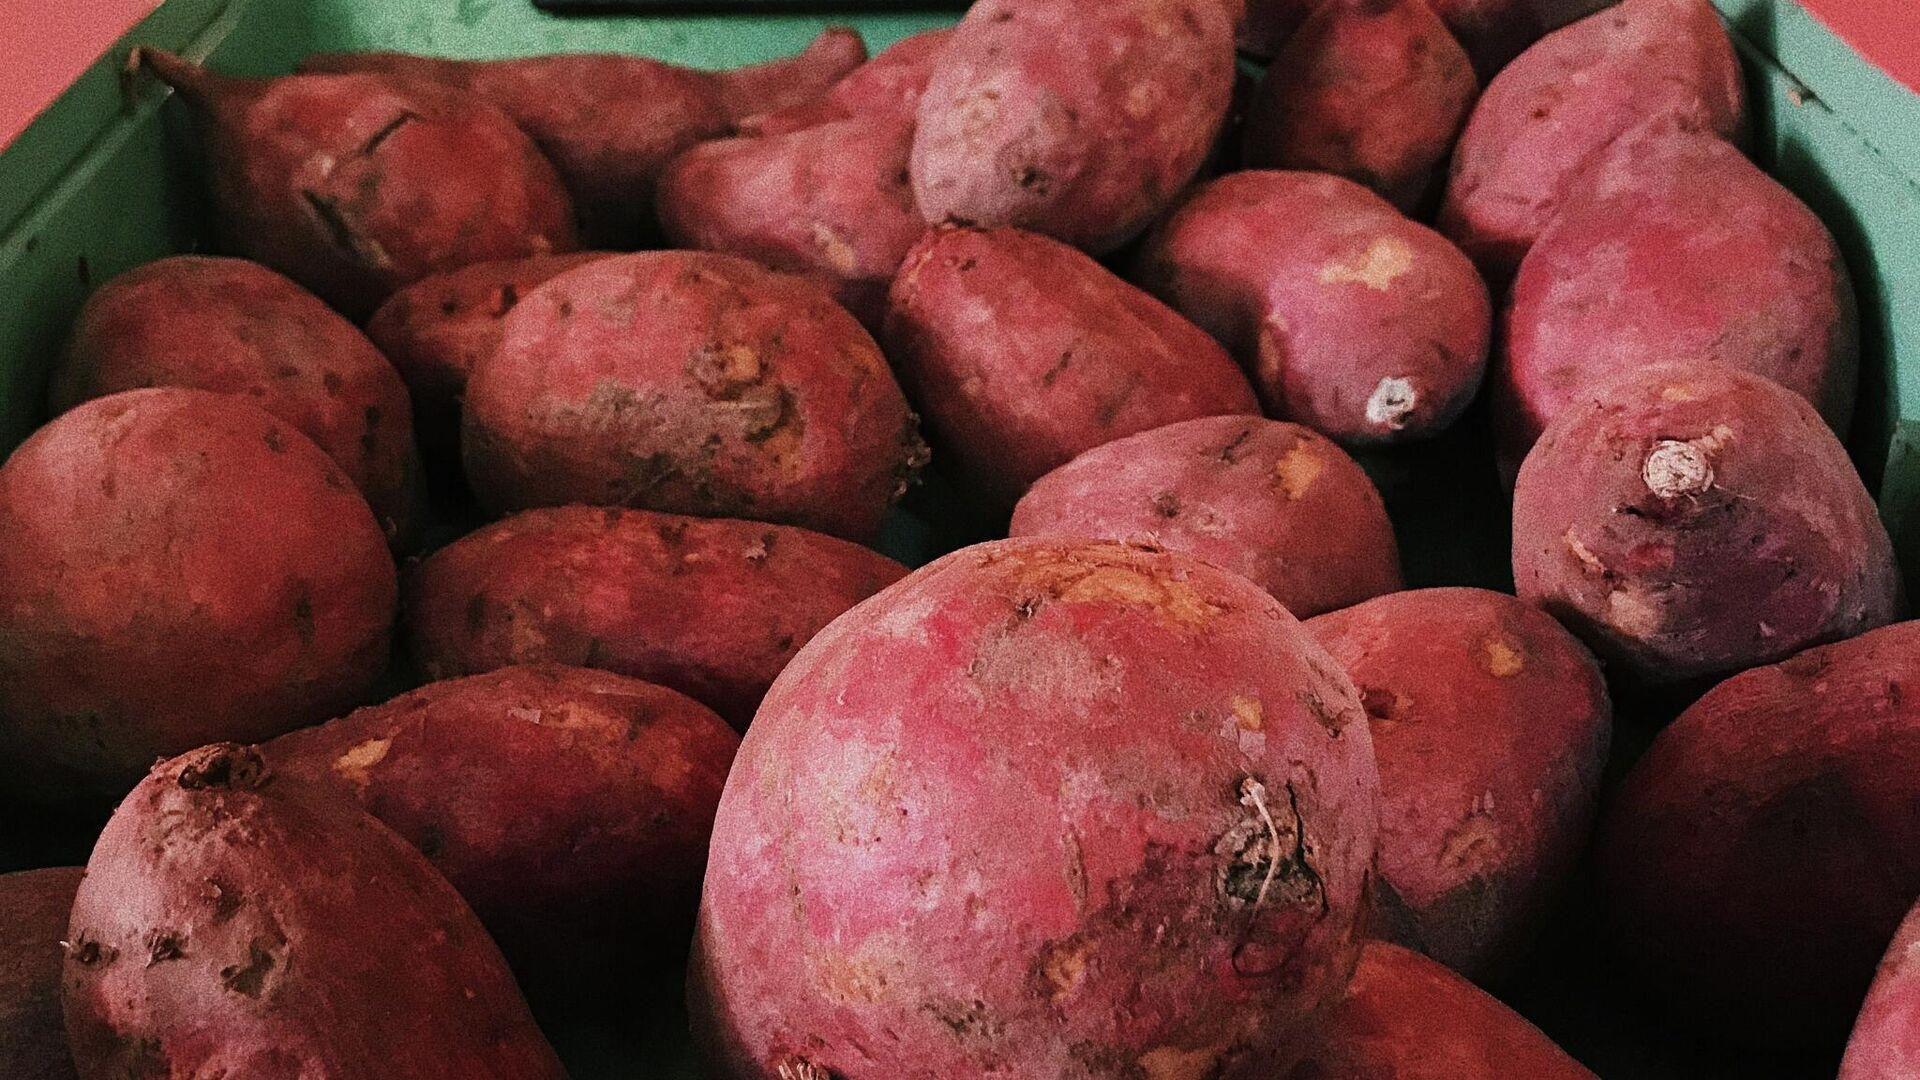 Unas batatas - Sputnik Mundo, 1920, 13.07.2021